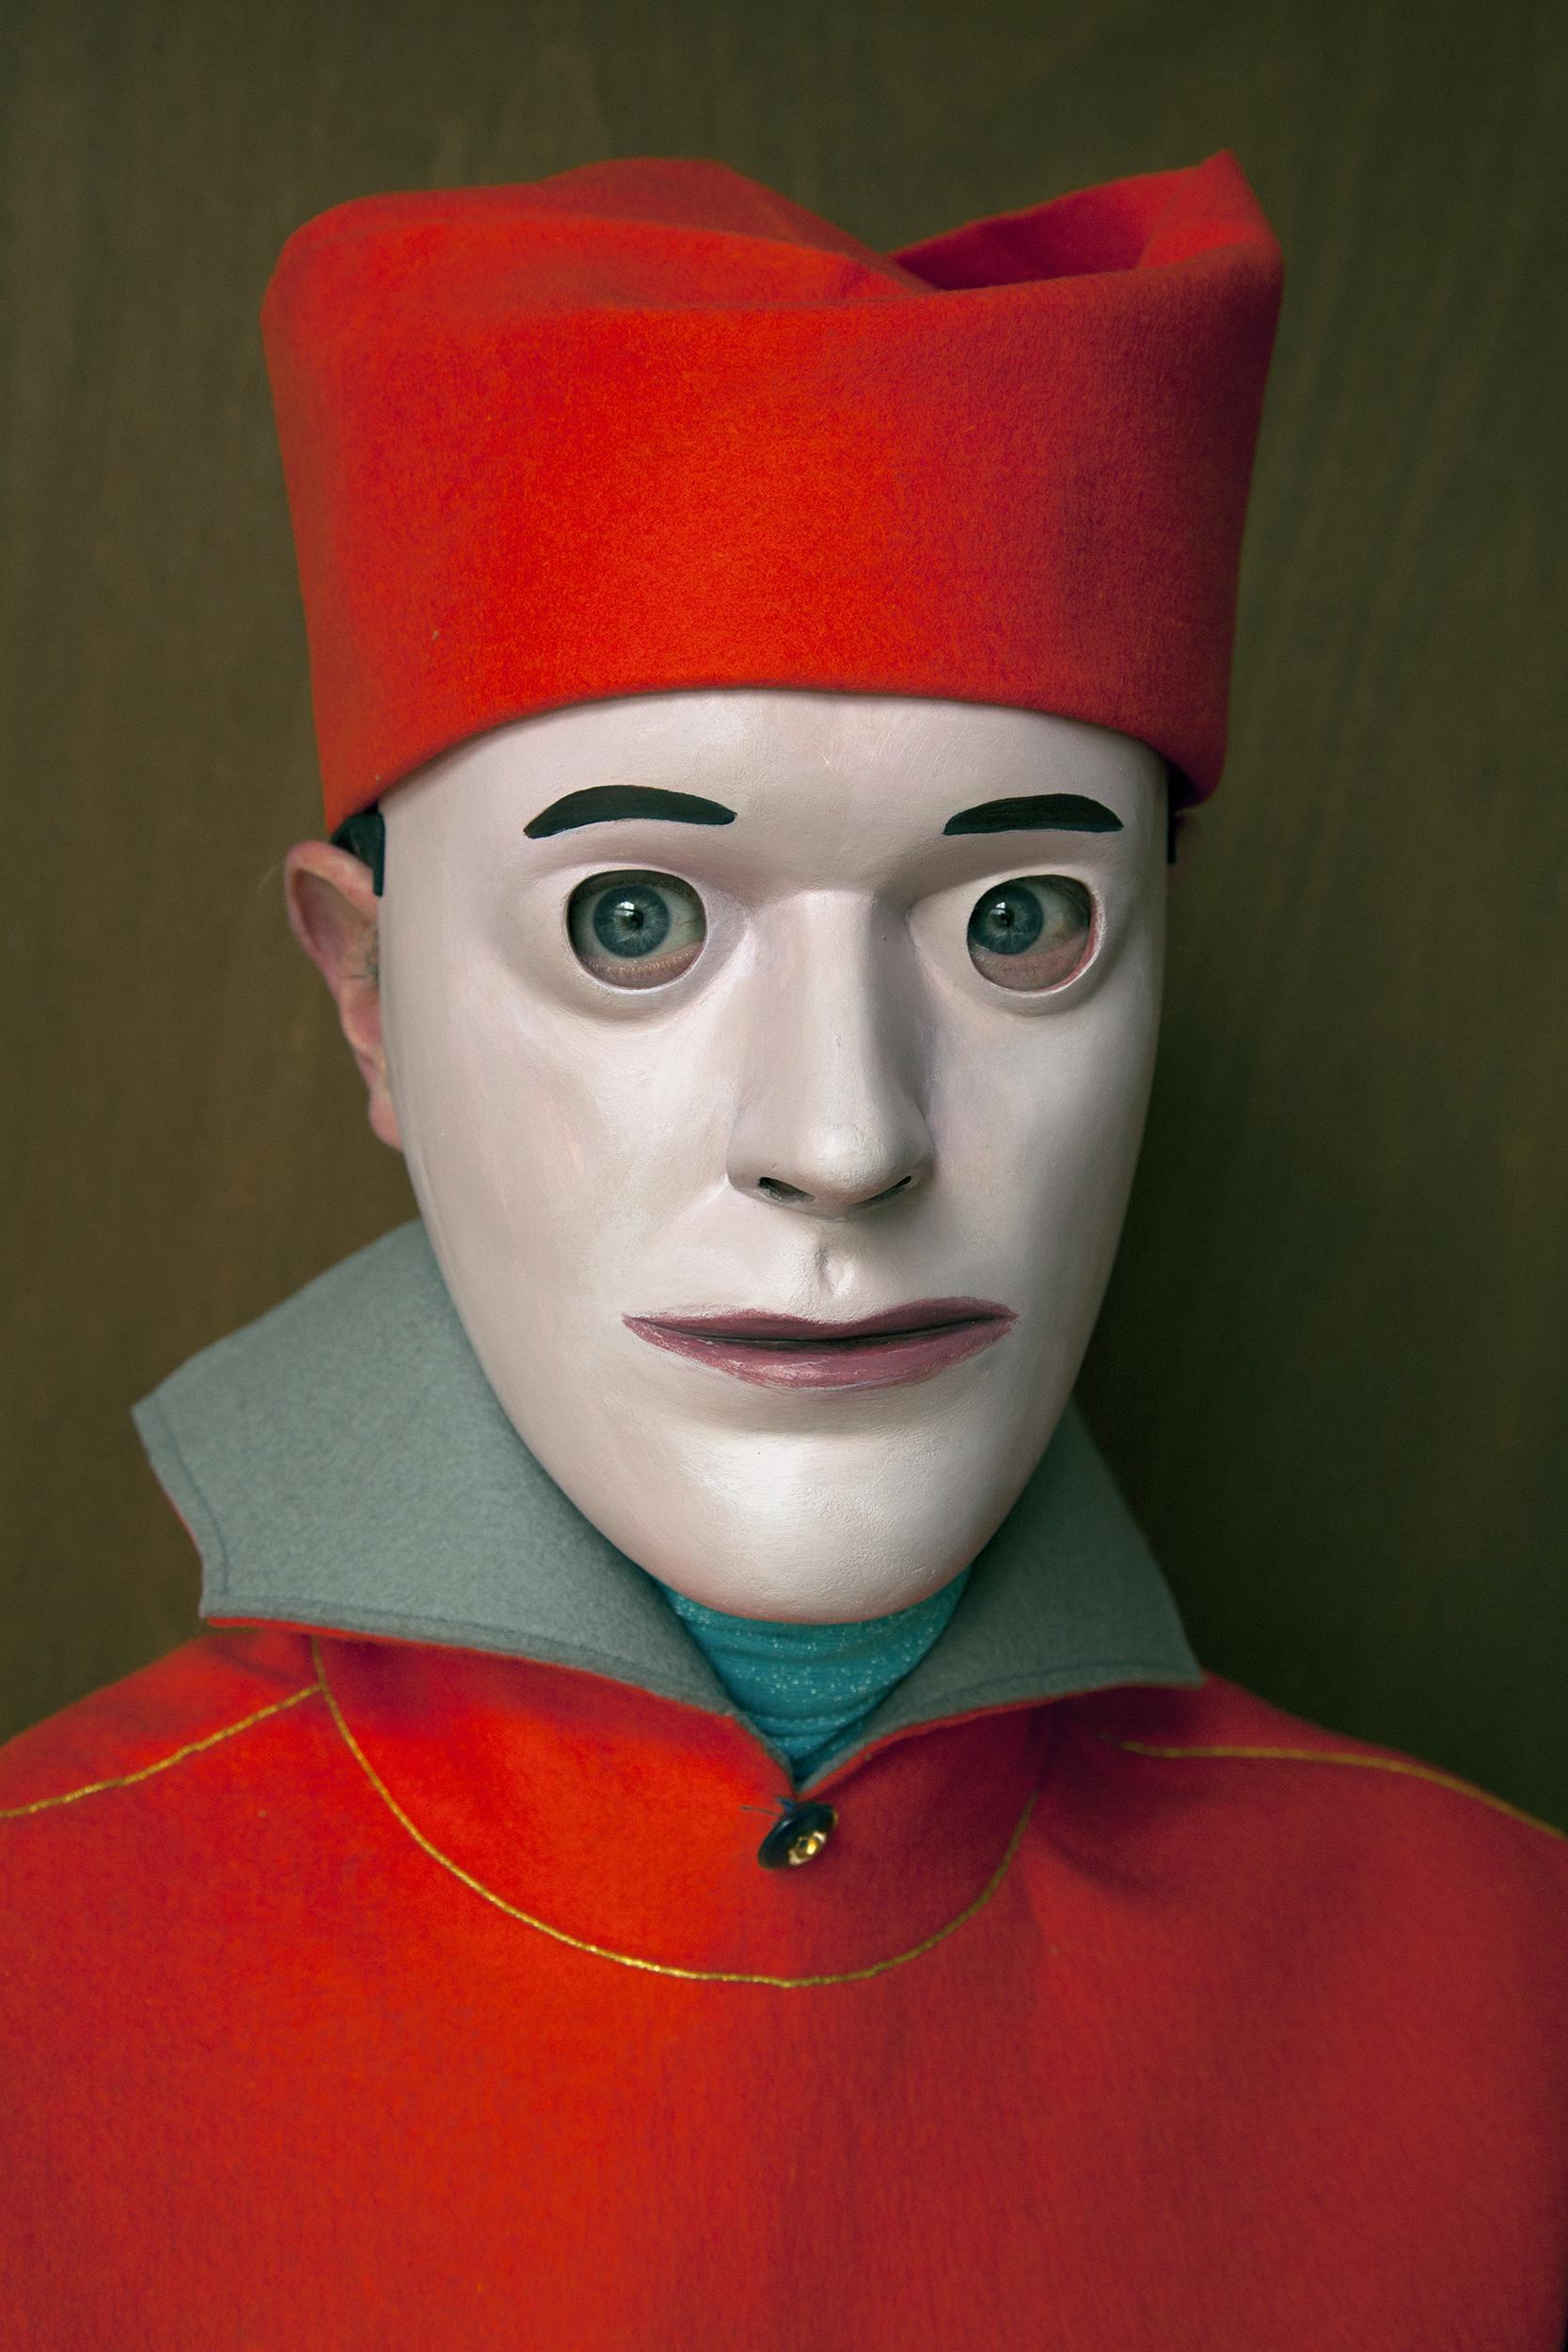 Self-portrait with Orange Cap, photograph by Wouter van Riessen